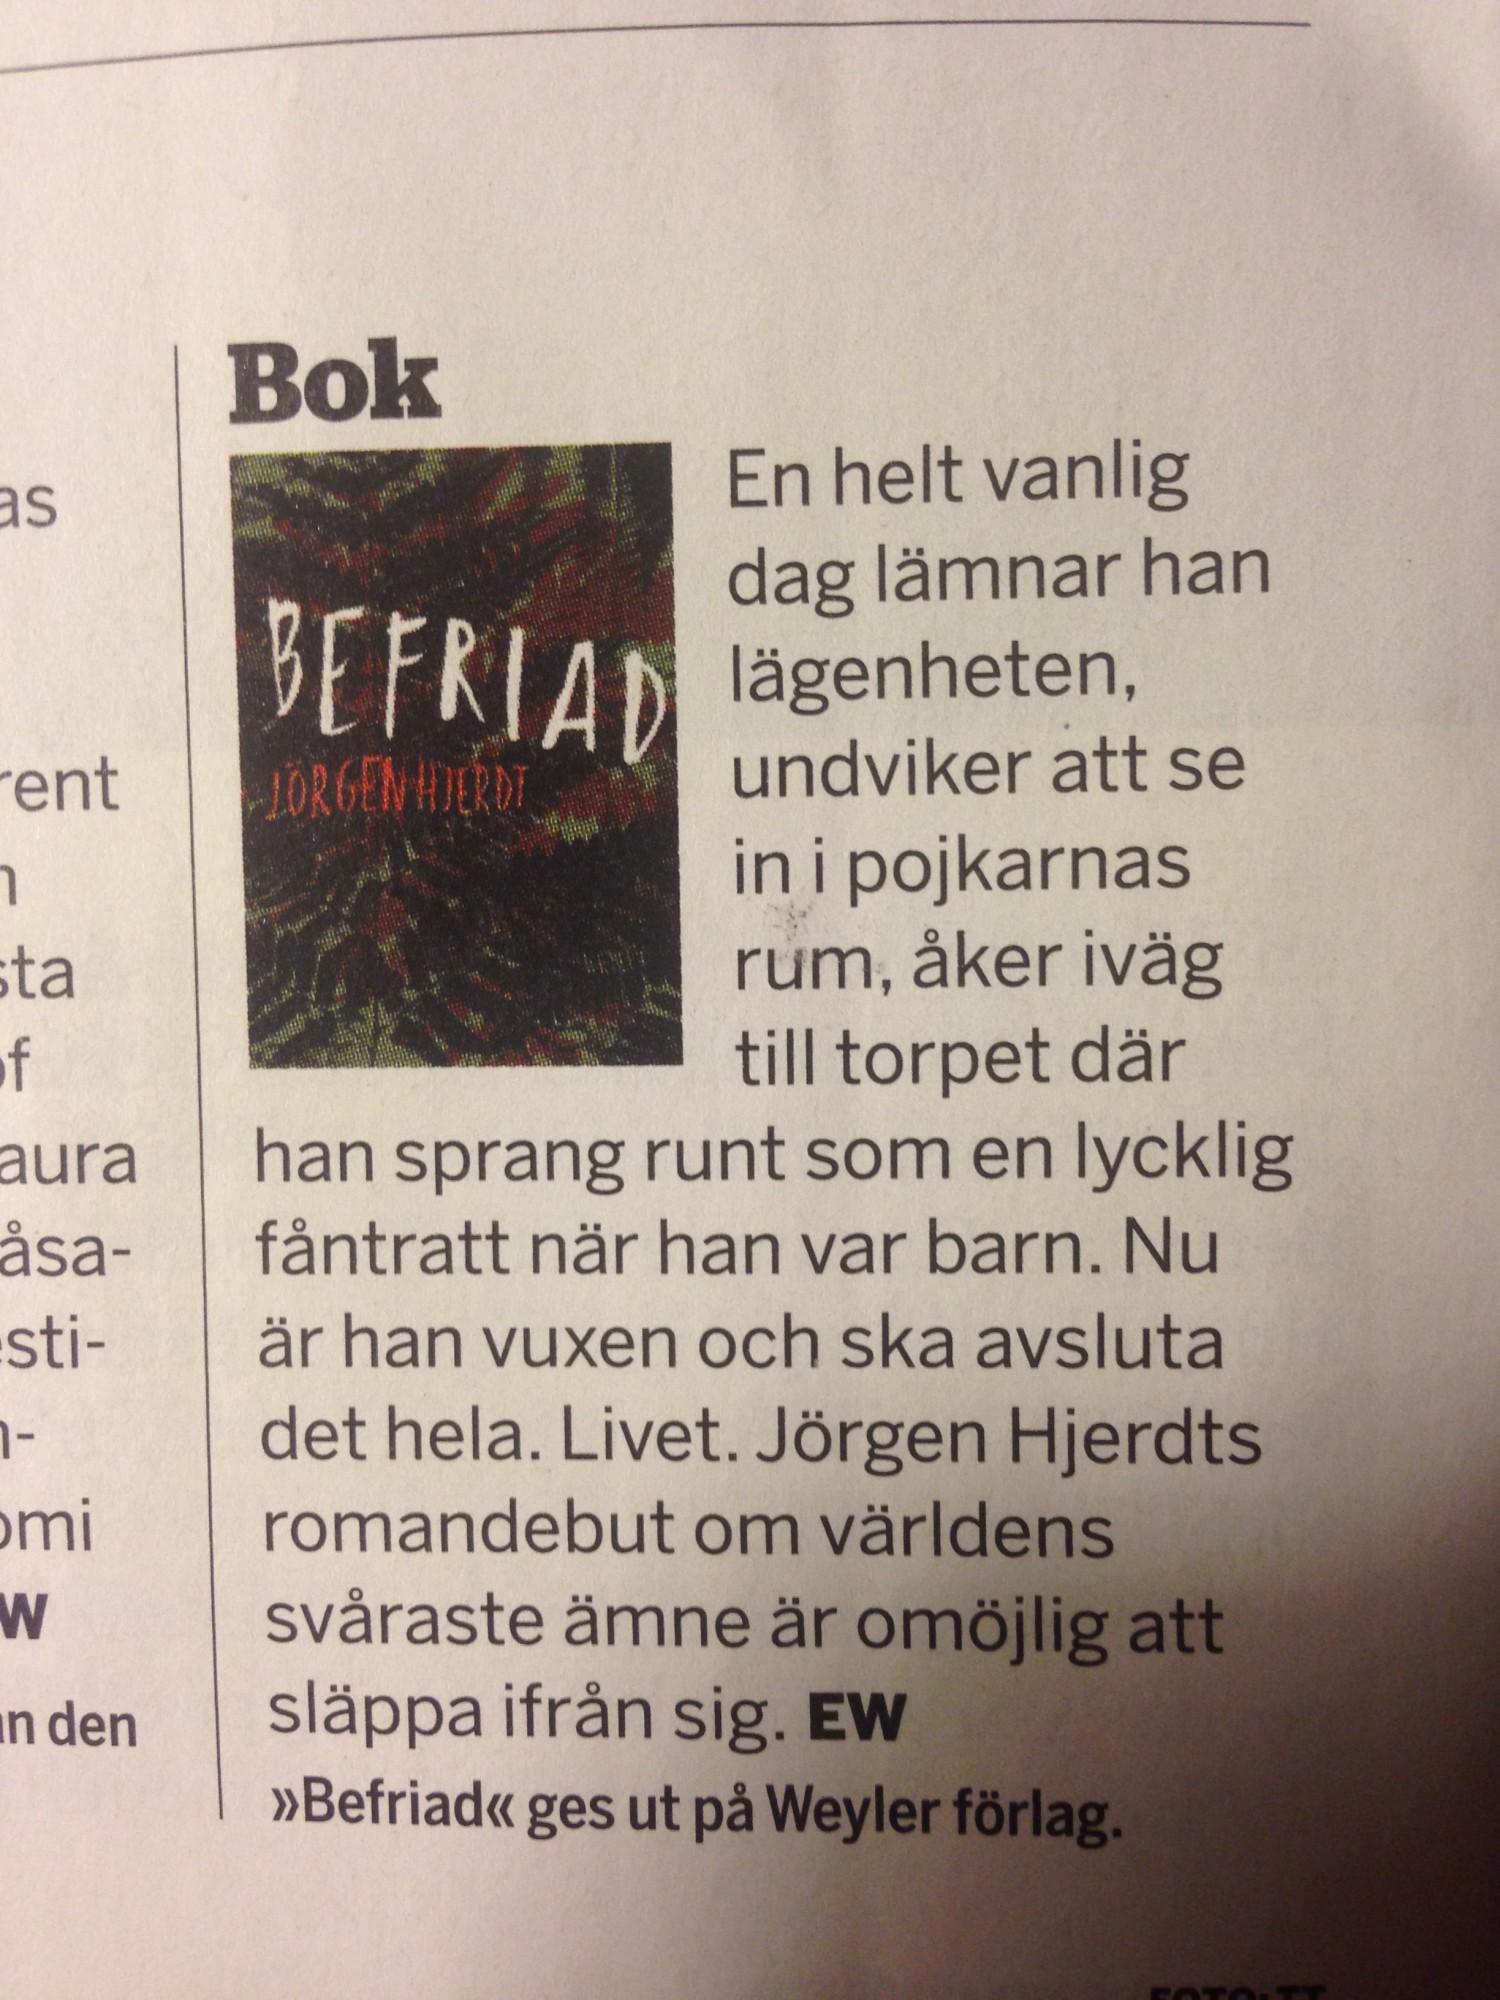 Fokus - Jörgen Hjerdt - Befriad